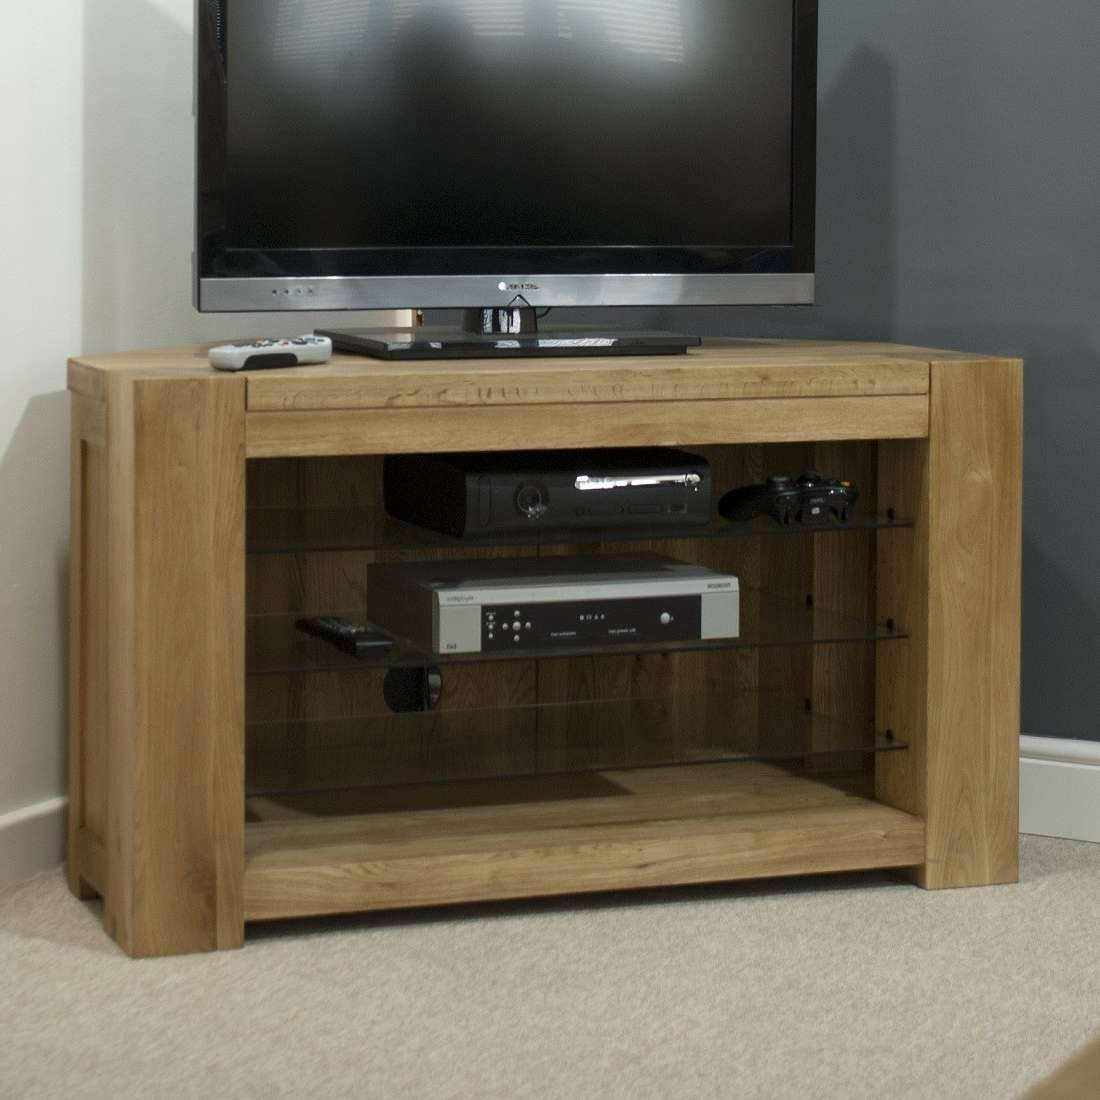 Oak Tv Units / Cabinets   Oak Furniture Uk Pertaining To Light Oak Corner Tv Cabinets (View 8 of 20)